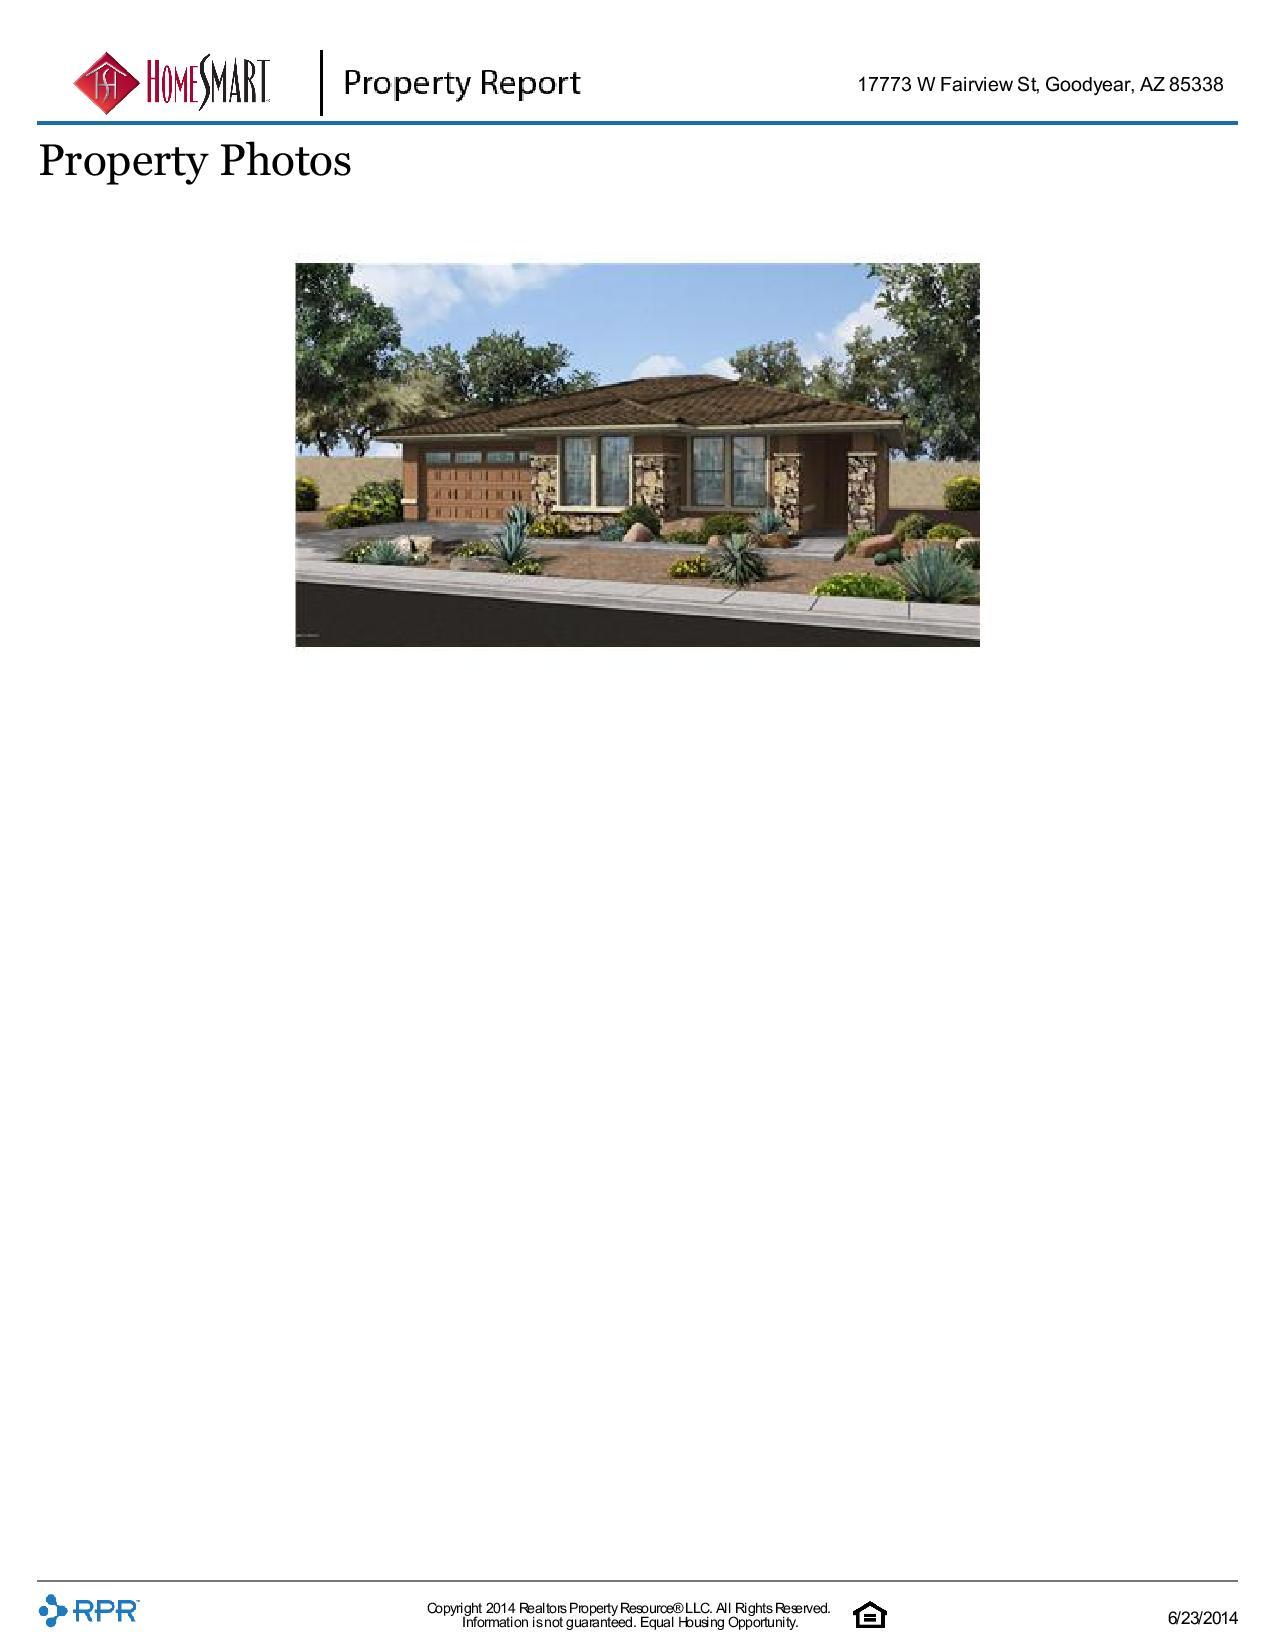 17773-W-Fairview-St-Goodyear-AZ-85338-page-005